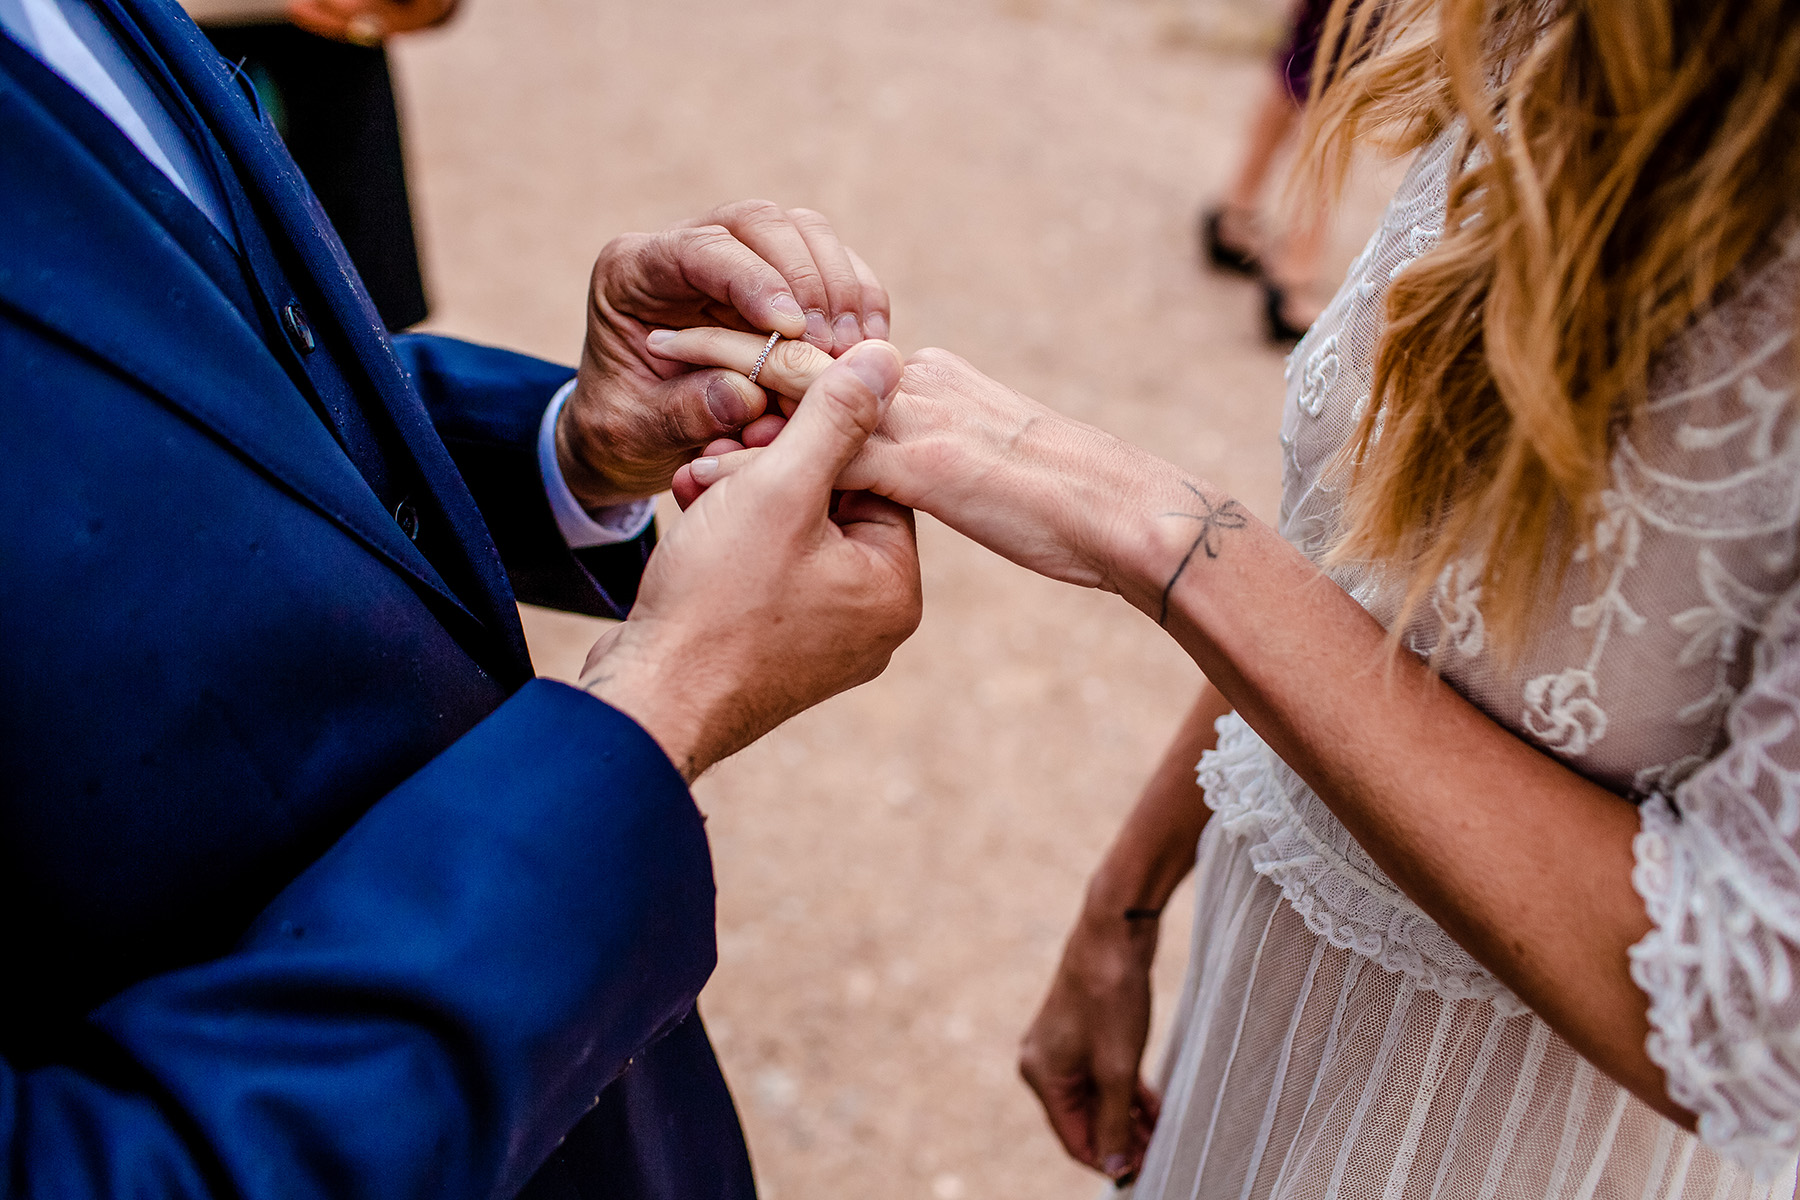 Melinda-Dustin-wedding-four-seasons-resort-santa-fe-new-mexico-1014